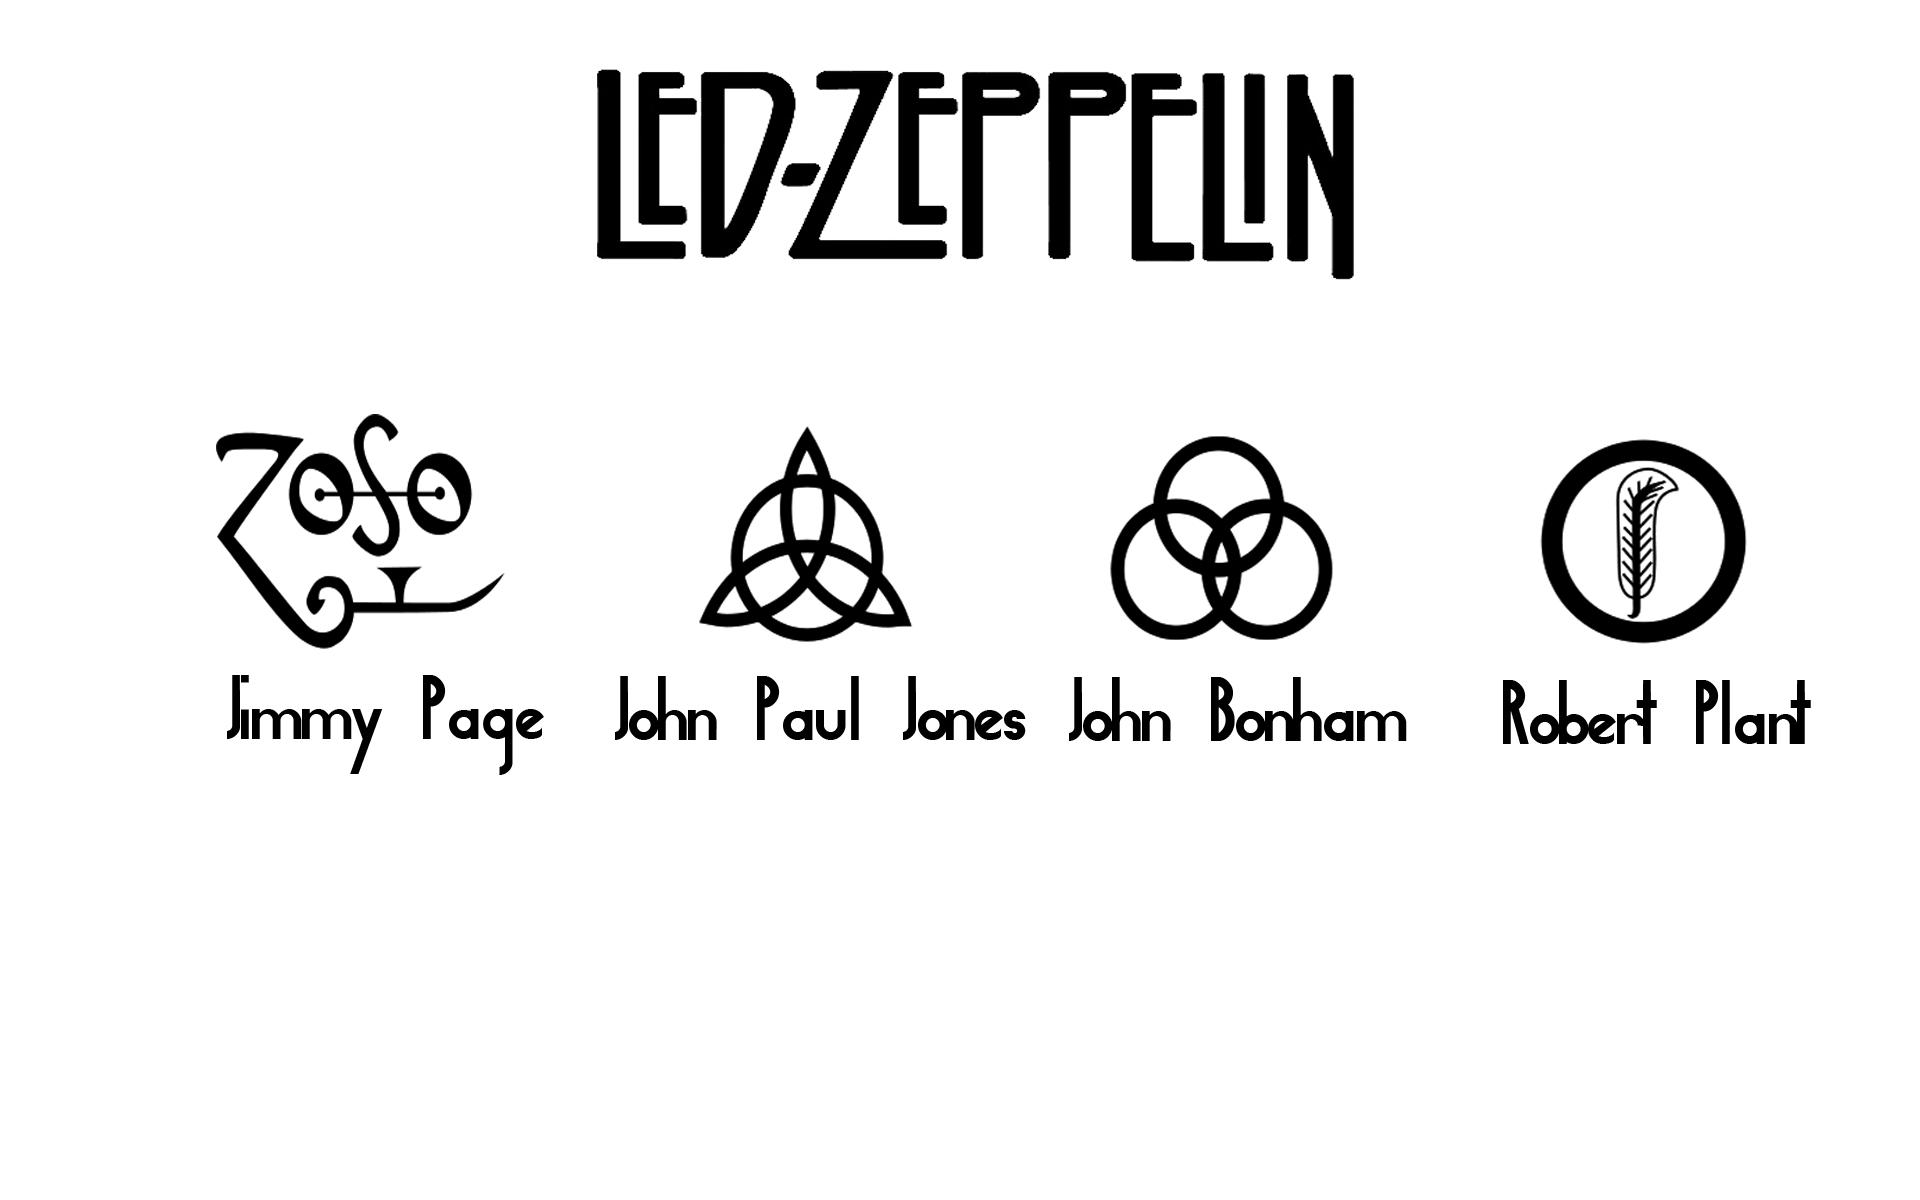 Led Zeppelin Music Bands Wallpaper 902534 Wallbase Cc Led Zeppelin Symbols Led Zeppelin Music Led Zeppelin Poster